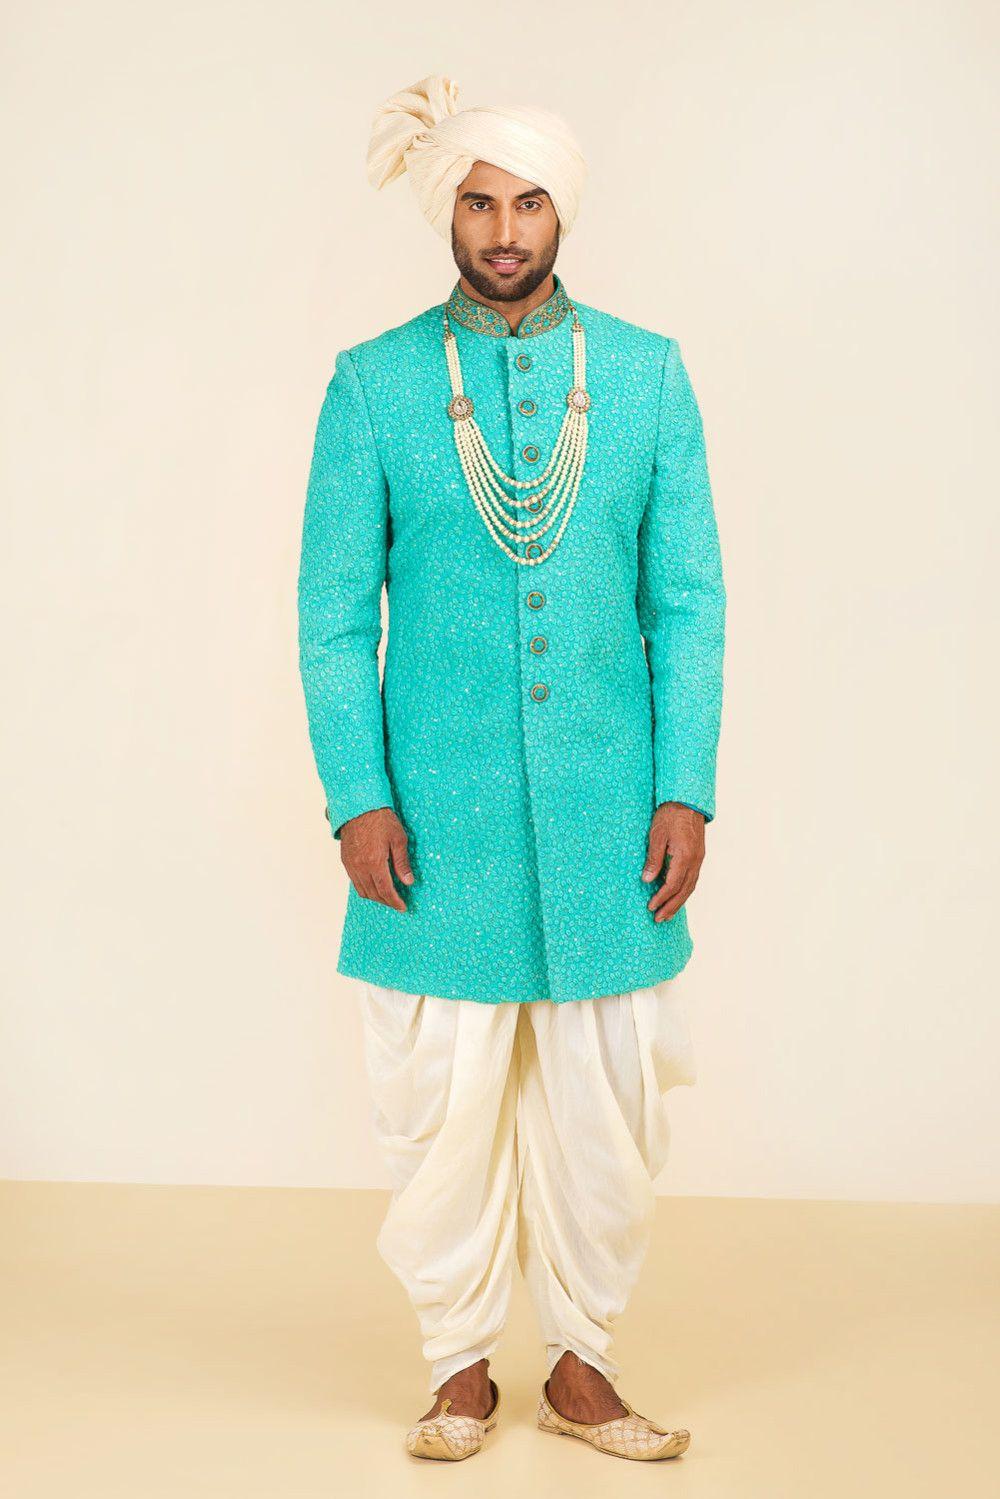 Cute Latest Wedding Suits For Indian Groom Photos - Wedding Ideas ...